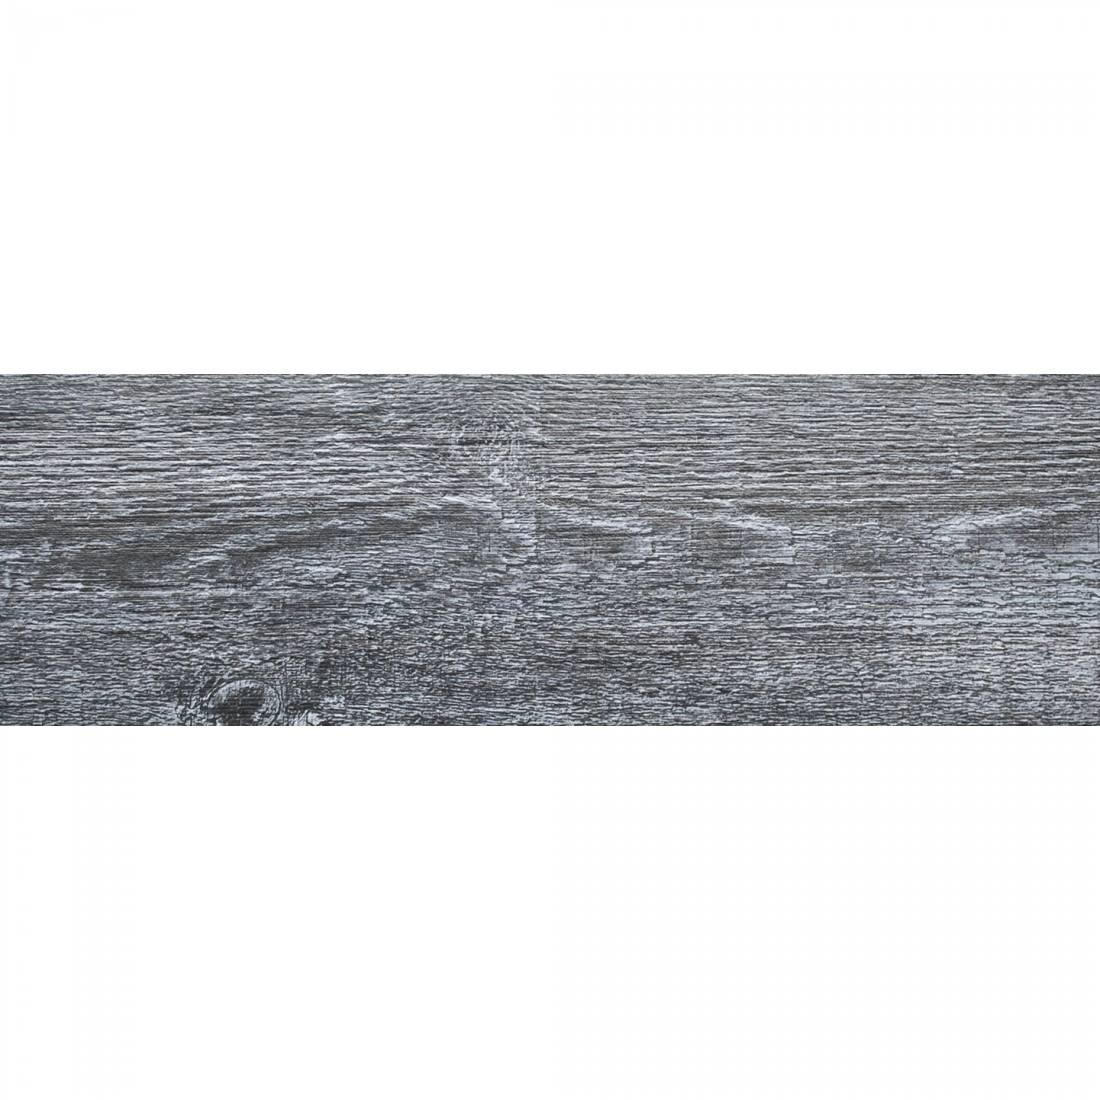 Pino Wood 16.5x49.5 Black 1